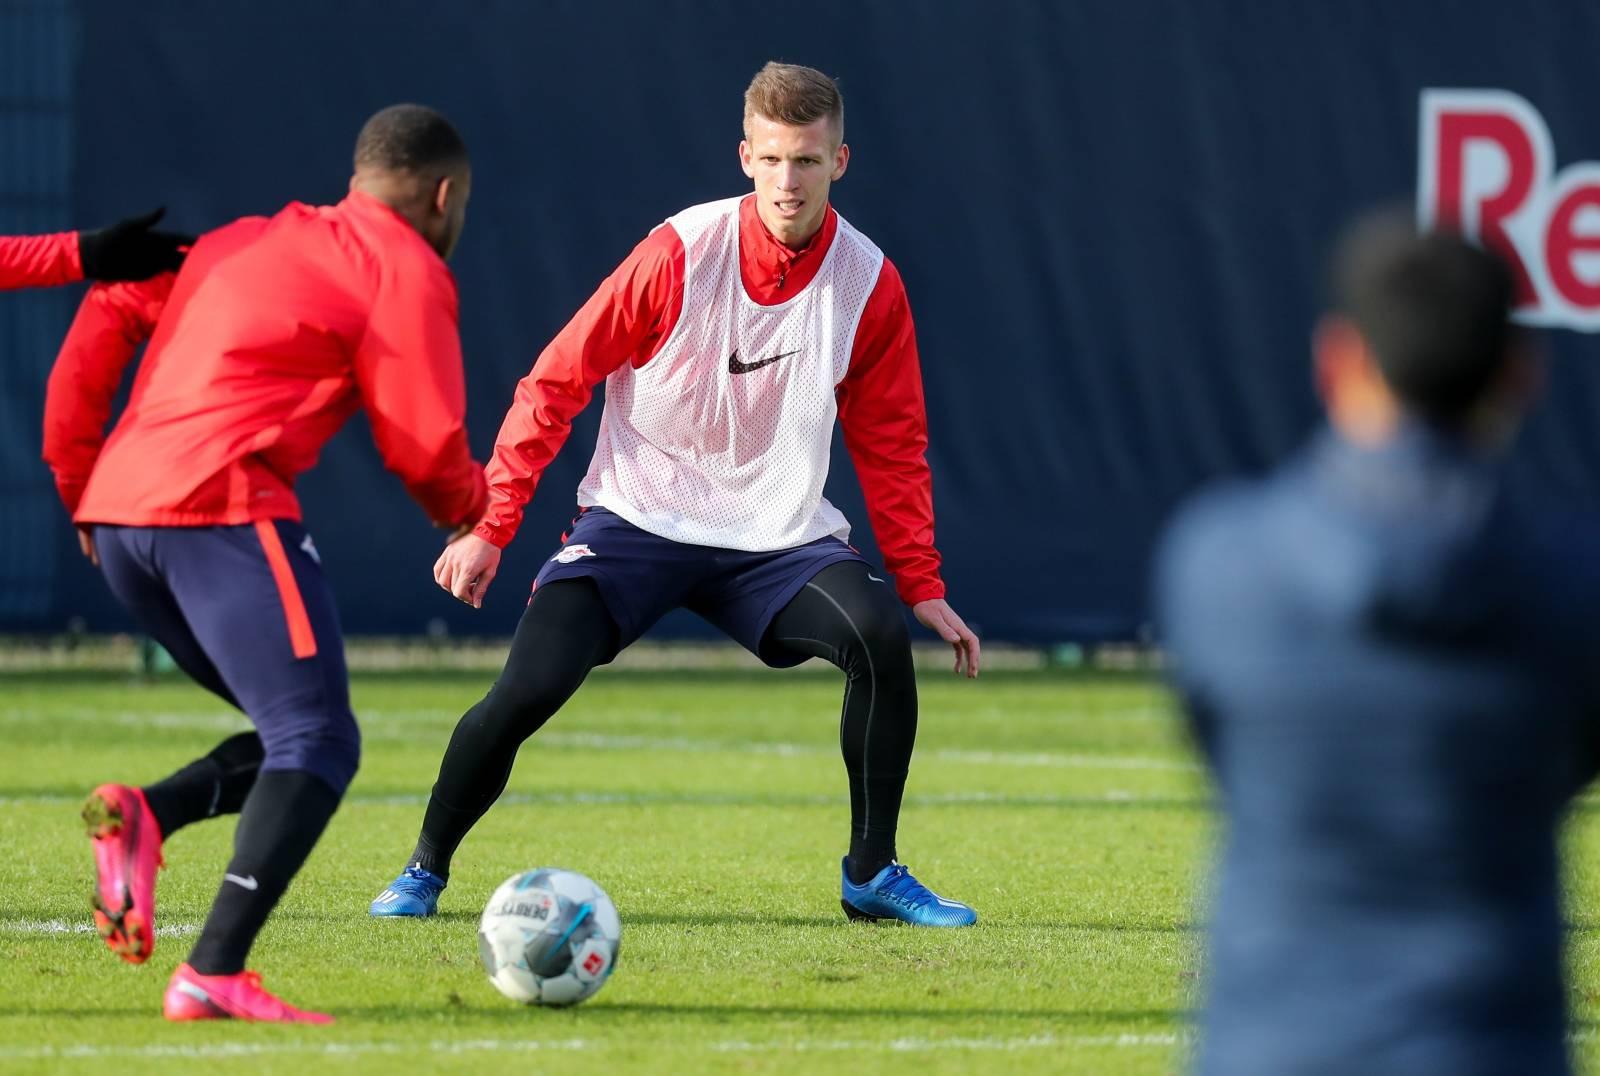 RB Leipzig presents new addition Olmo